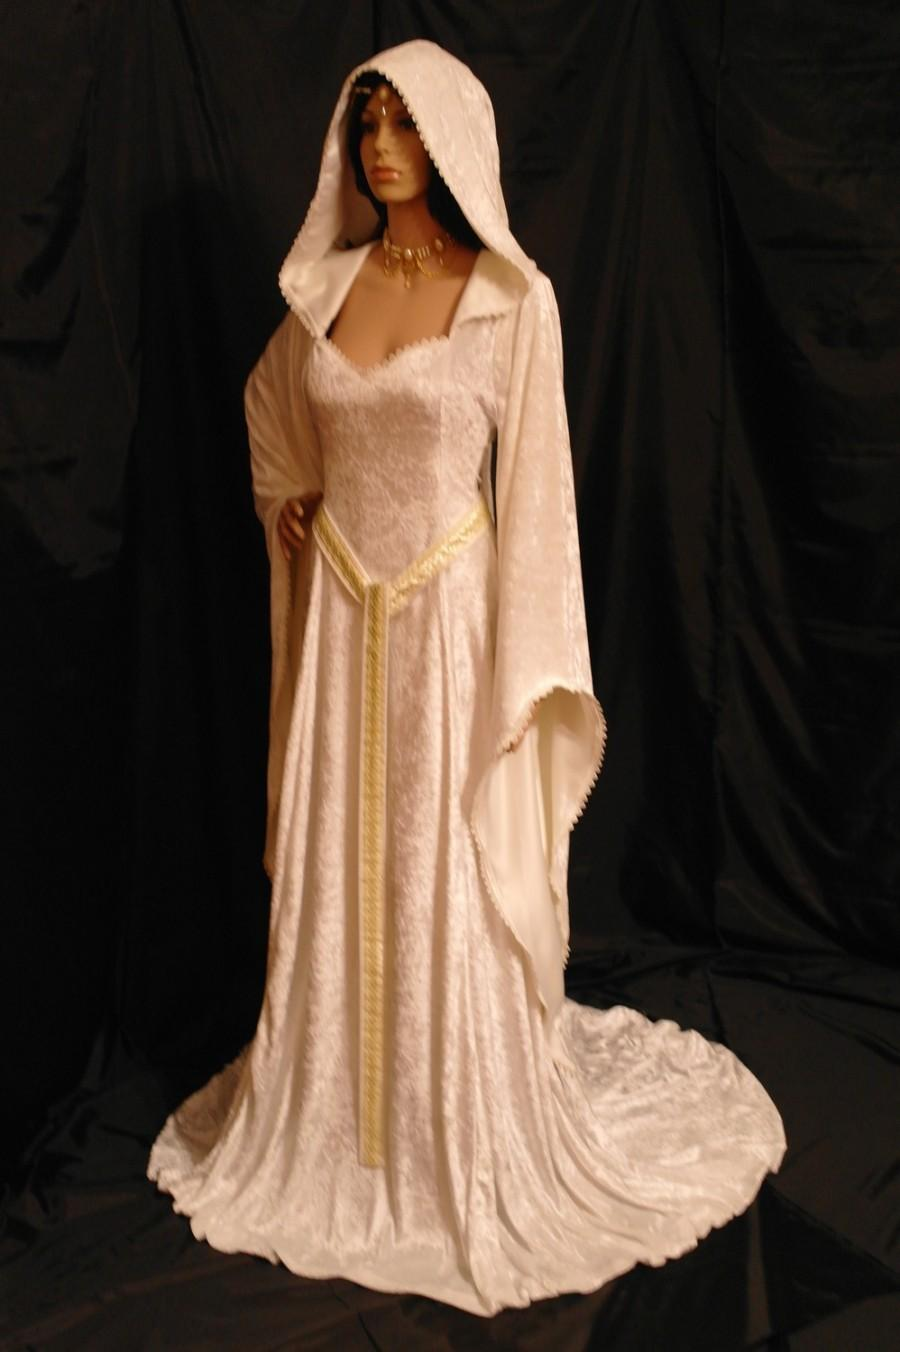 Elven Dress Pixie Dress Medieval Dress Renaissance Dress Fairy